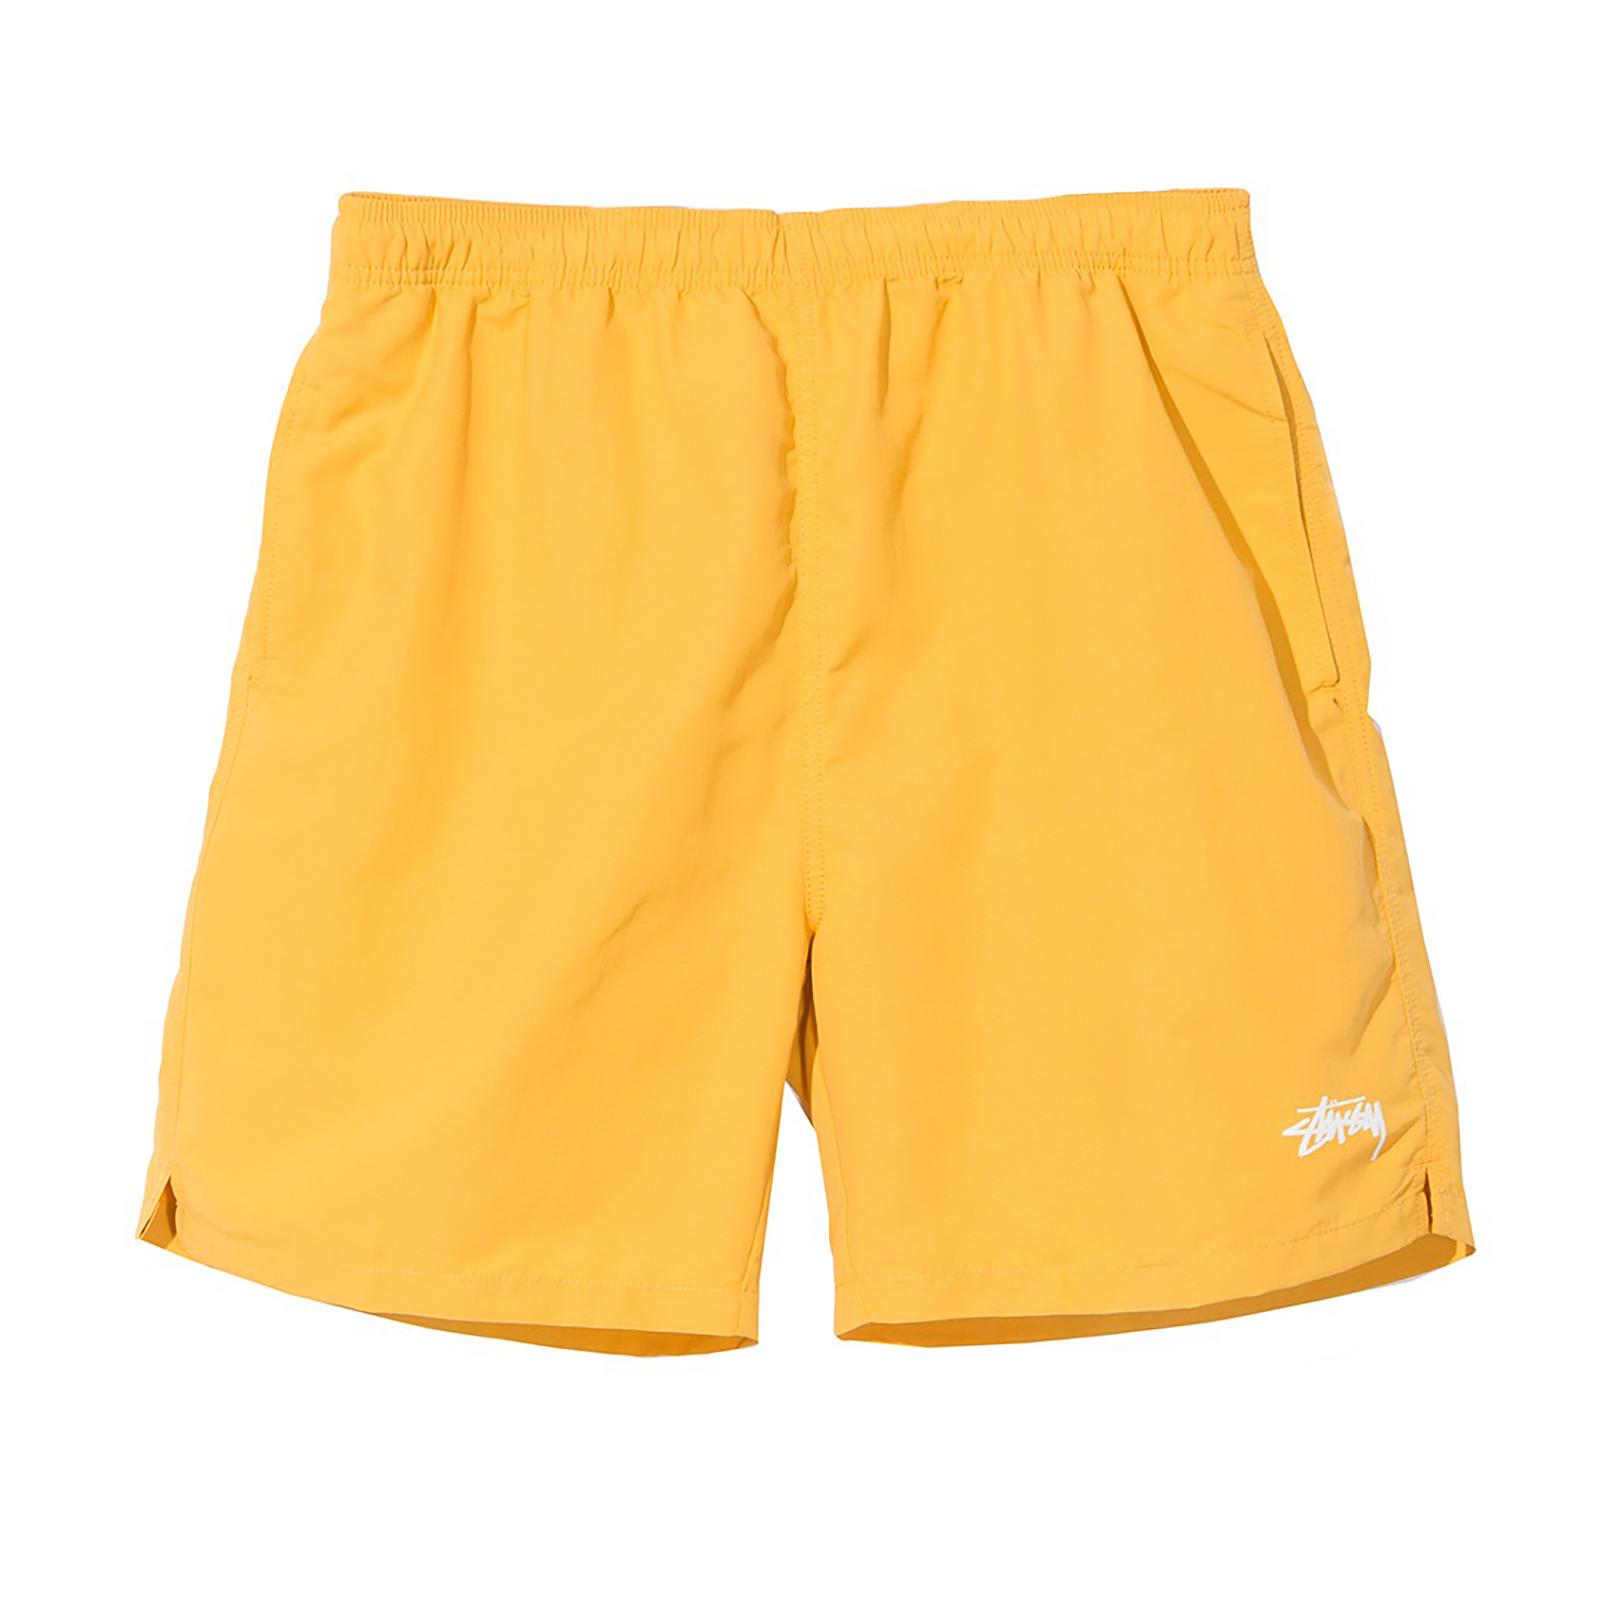 22aeb7f2791d49 Stussy Shorts Stock Water Short Orange Arancione | eBay